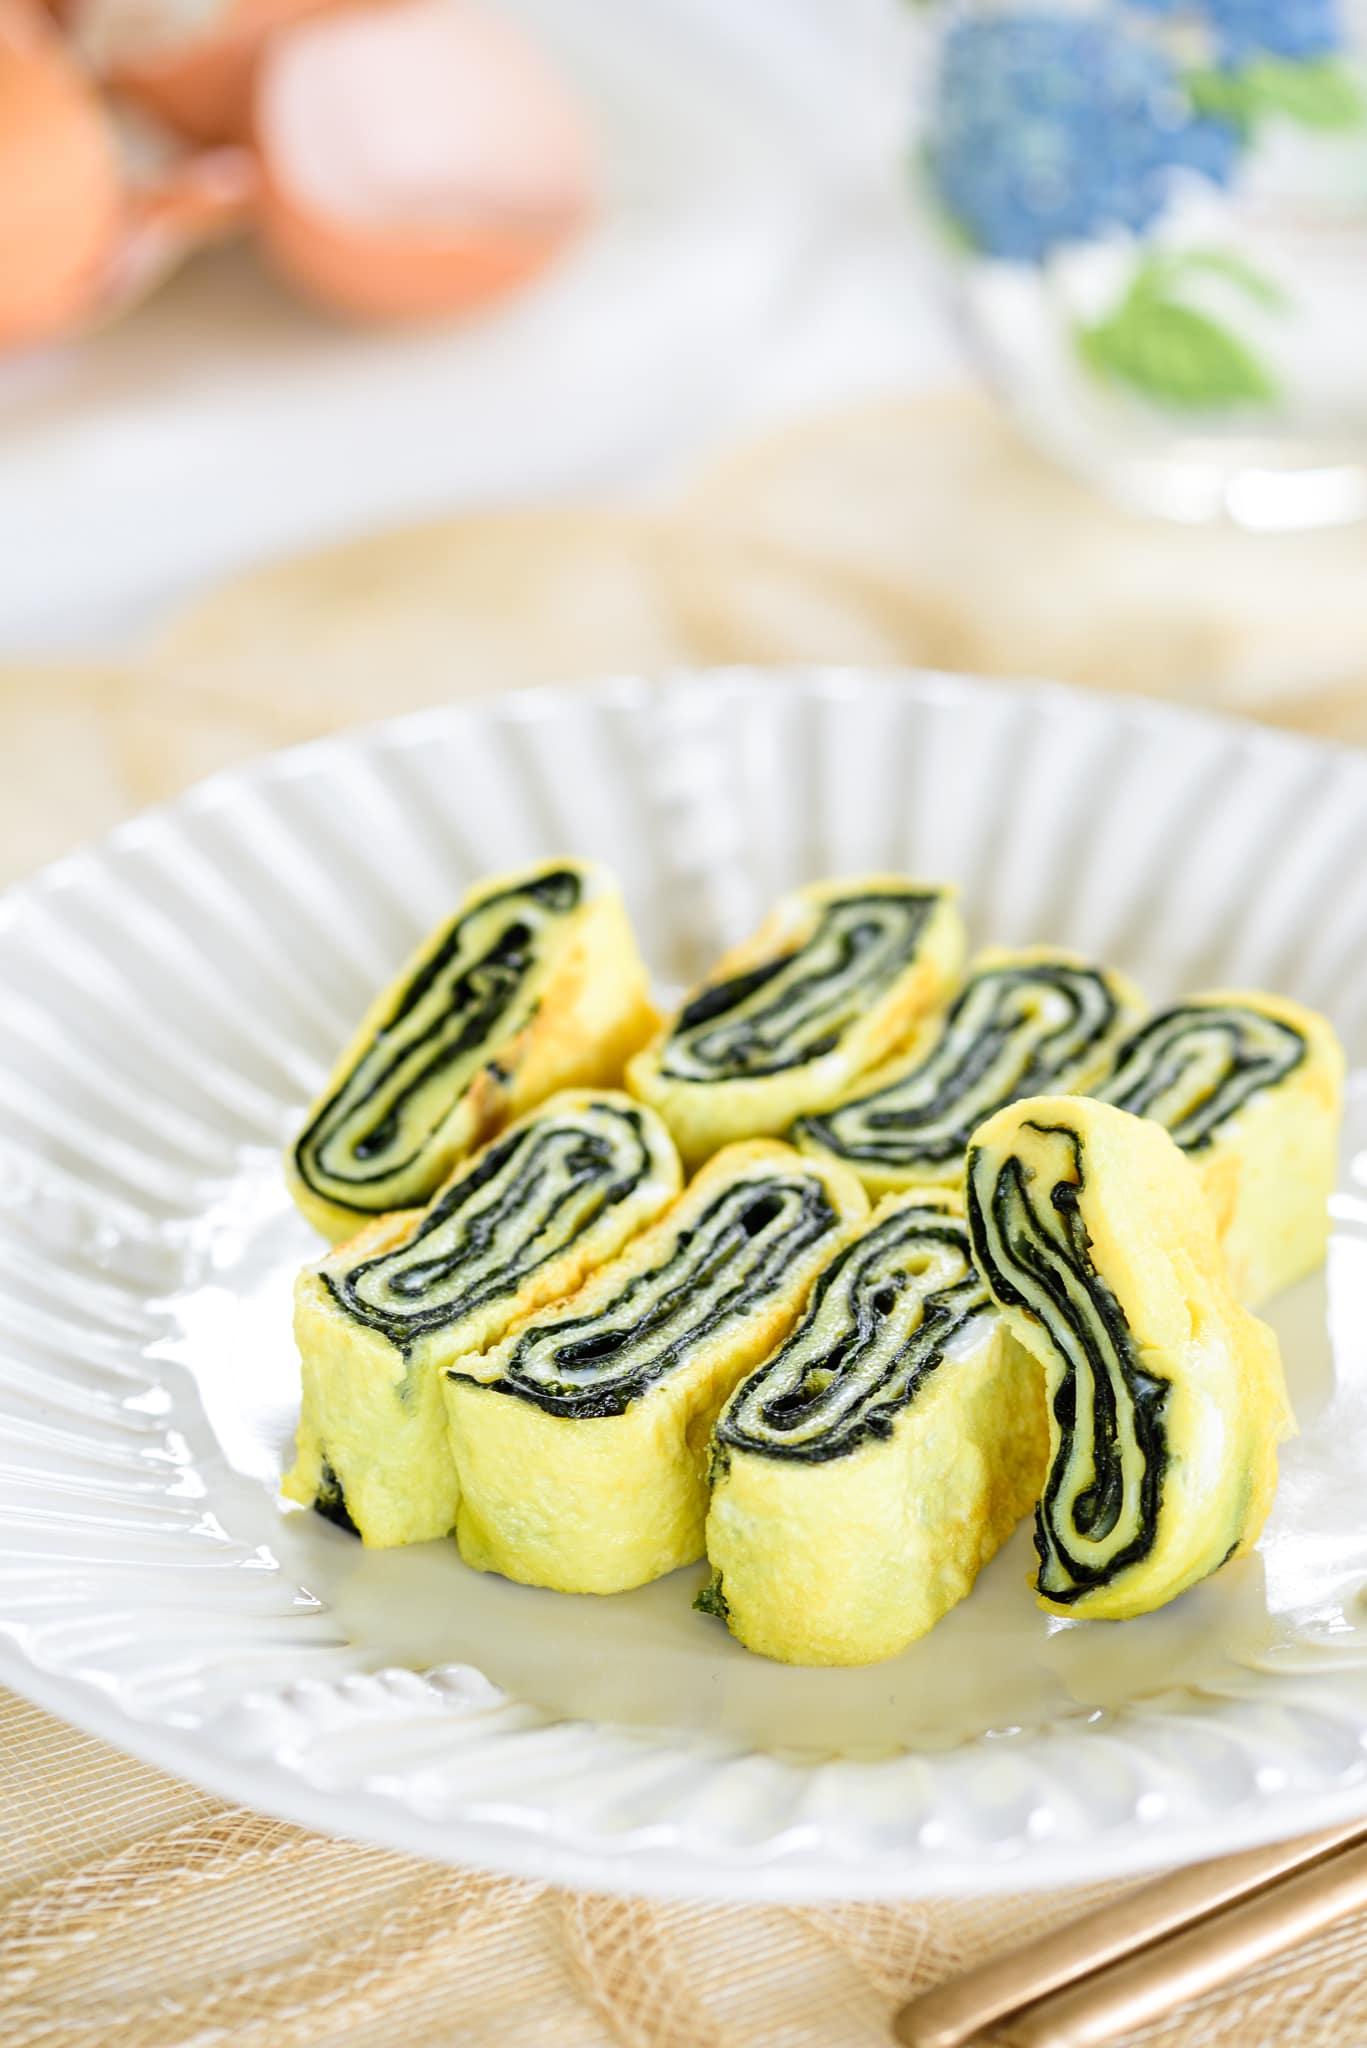 DSC0076 2 - Gyeran Mari (Rolled Omelette) with Seaweed